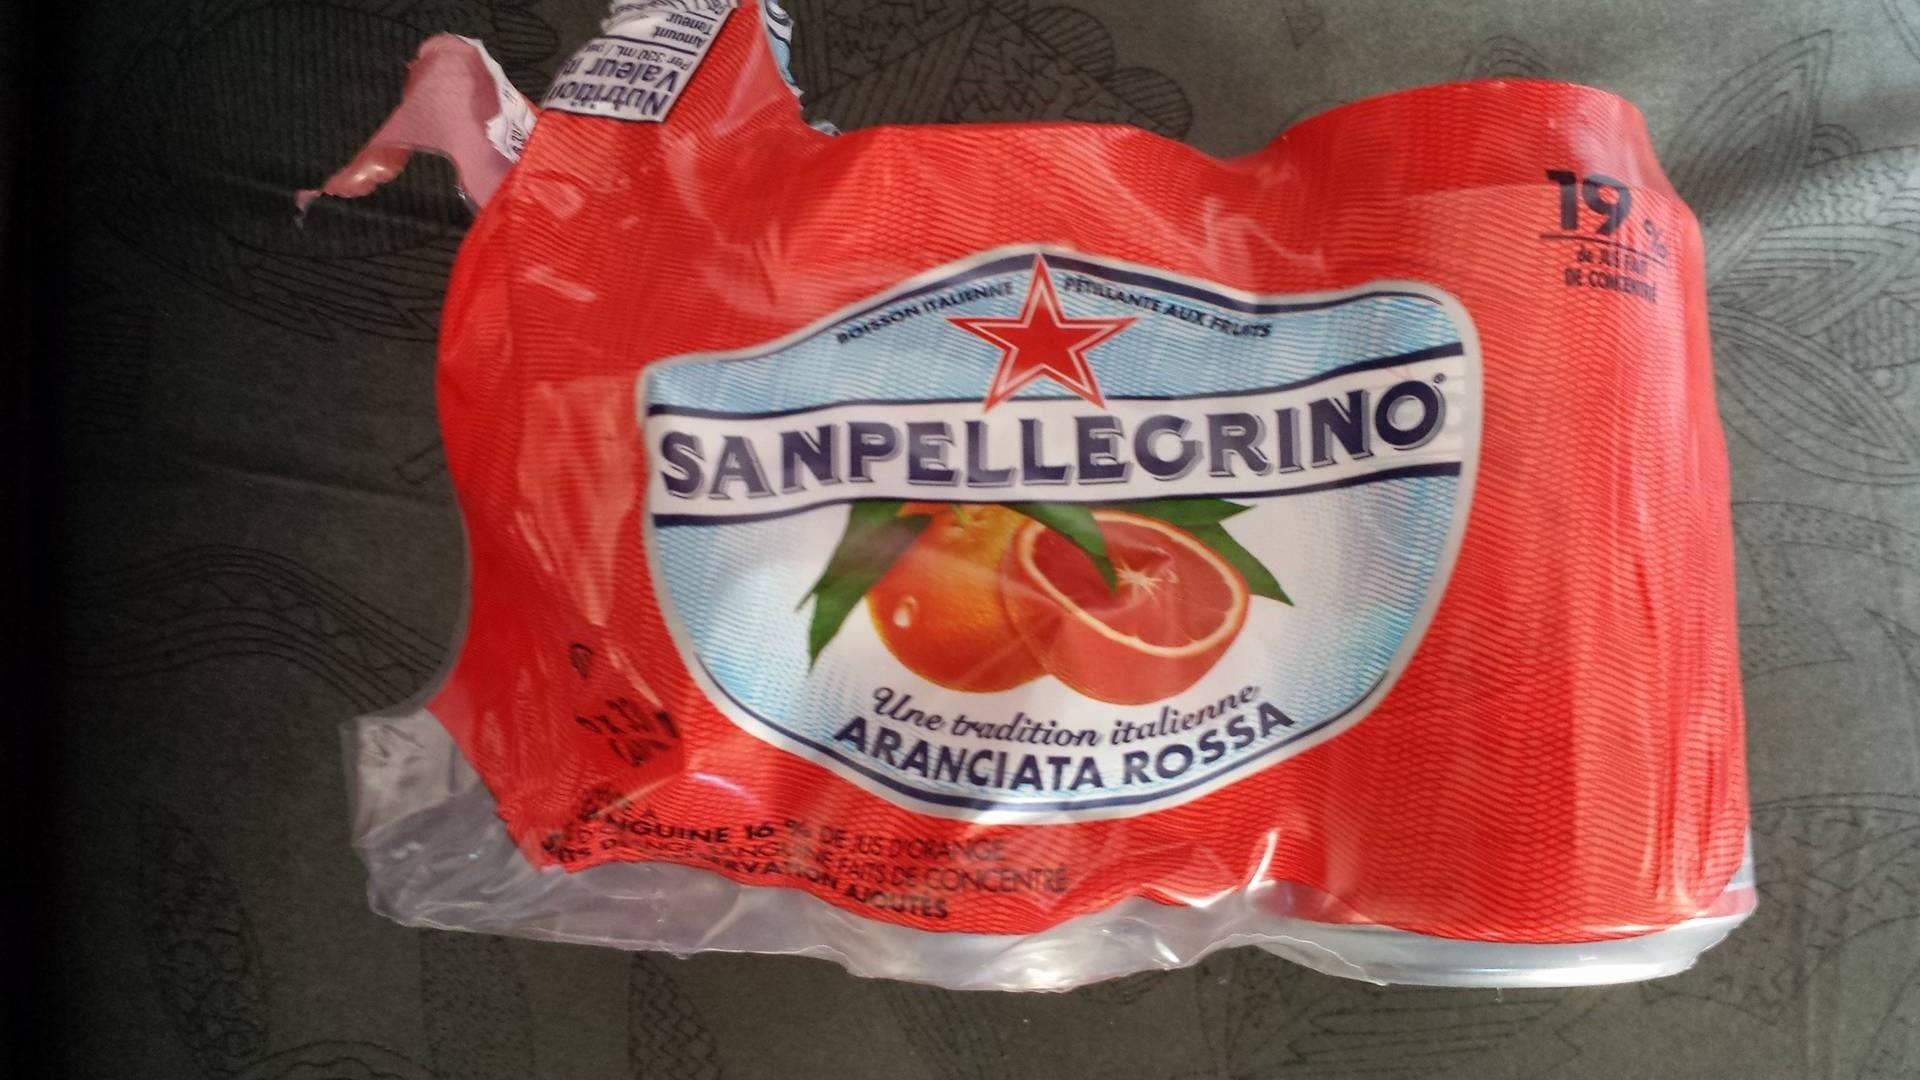 Sanpellegrino Arancia Rossa